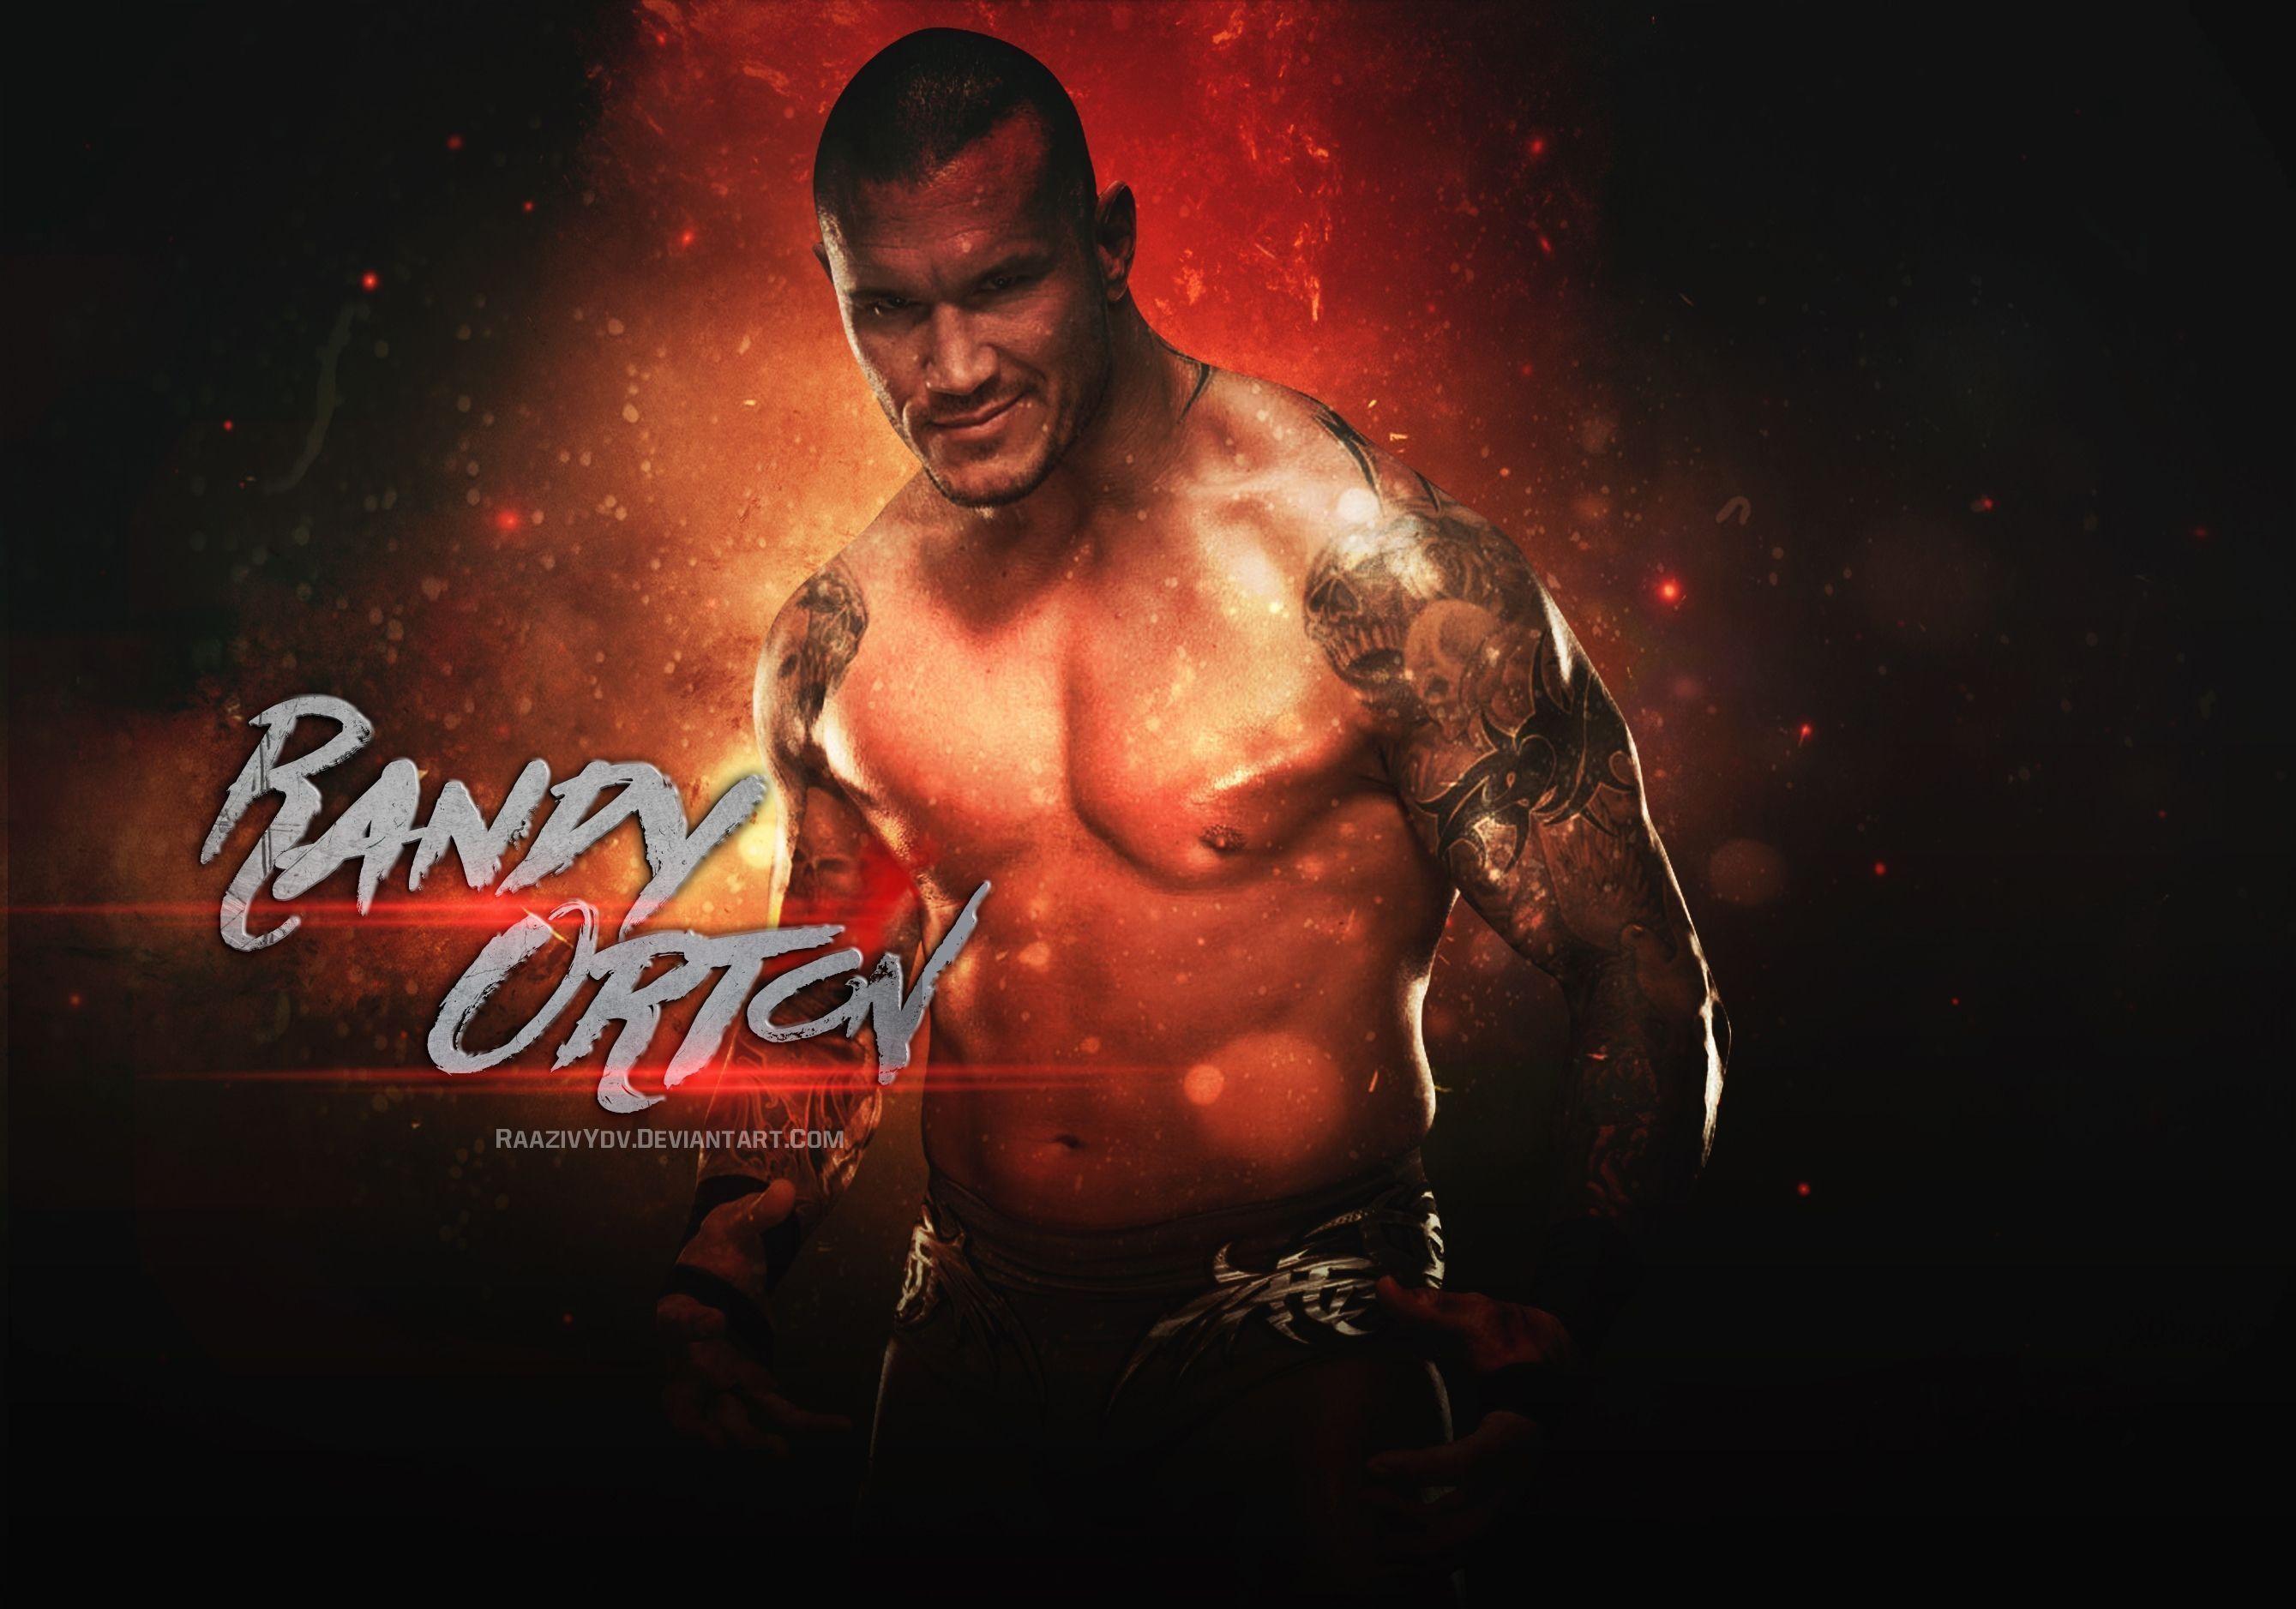 Hd Wwe Randy Orton Smiley Faces Wallpaper 2018